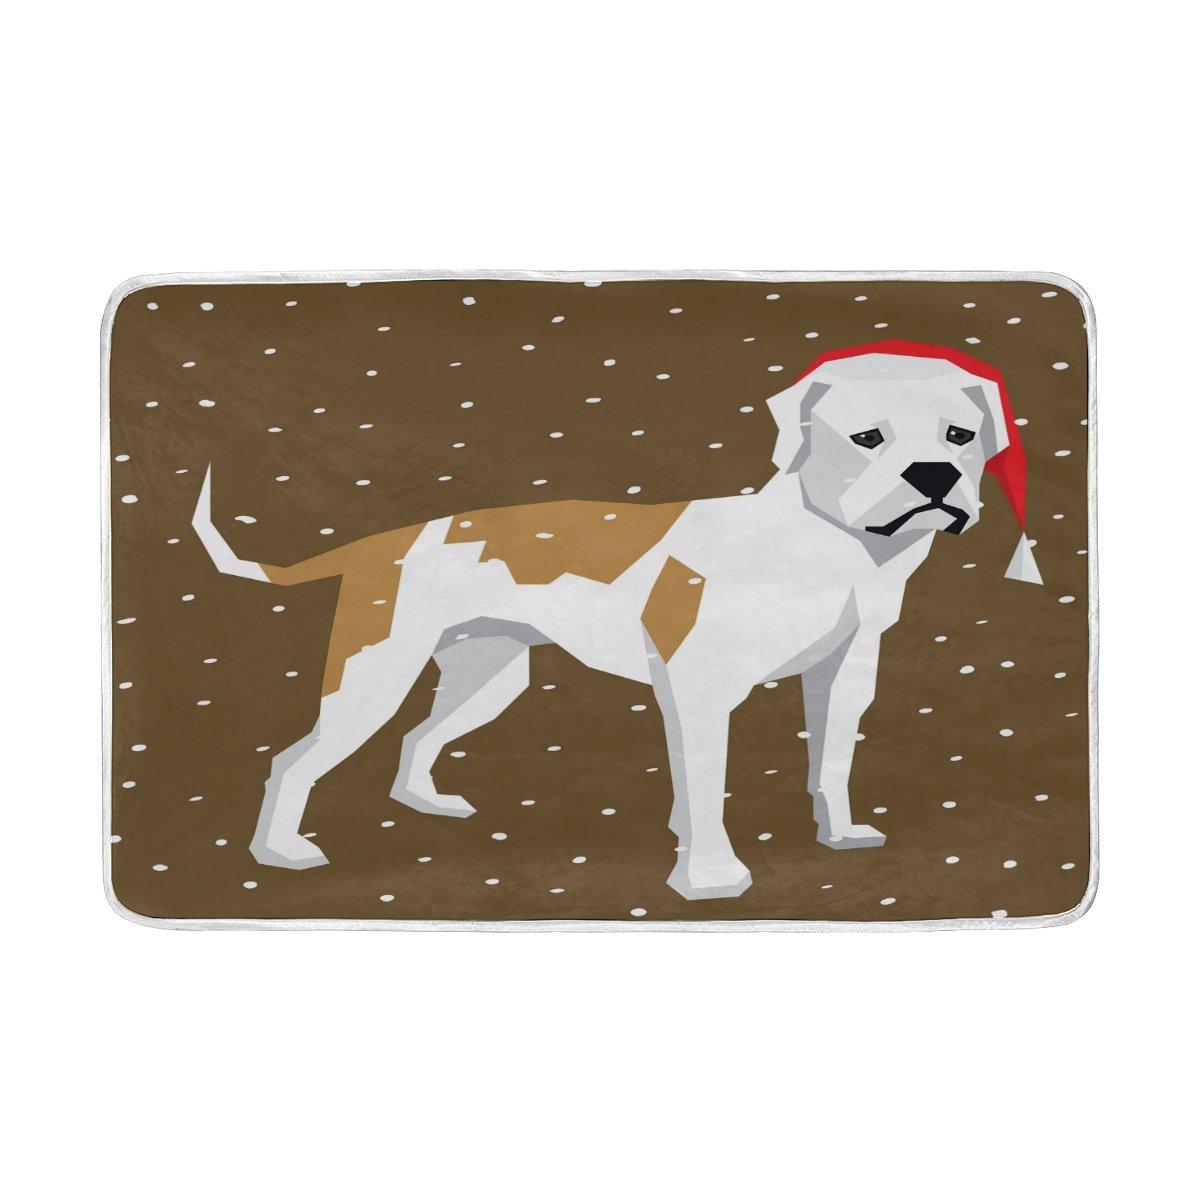 Alaza犬American Bulldog Snowflakes Animal Blanket Luxury Throw PersonalizedスタイリッシュFuzzyソフト暖かい軽量毛布ベッド用Counch All Seasonユニセックス大人用メンズレディース男の子女の子60 x 90インチ B077MBZJPH